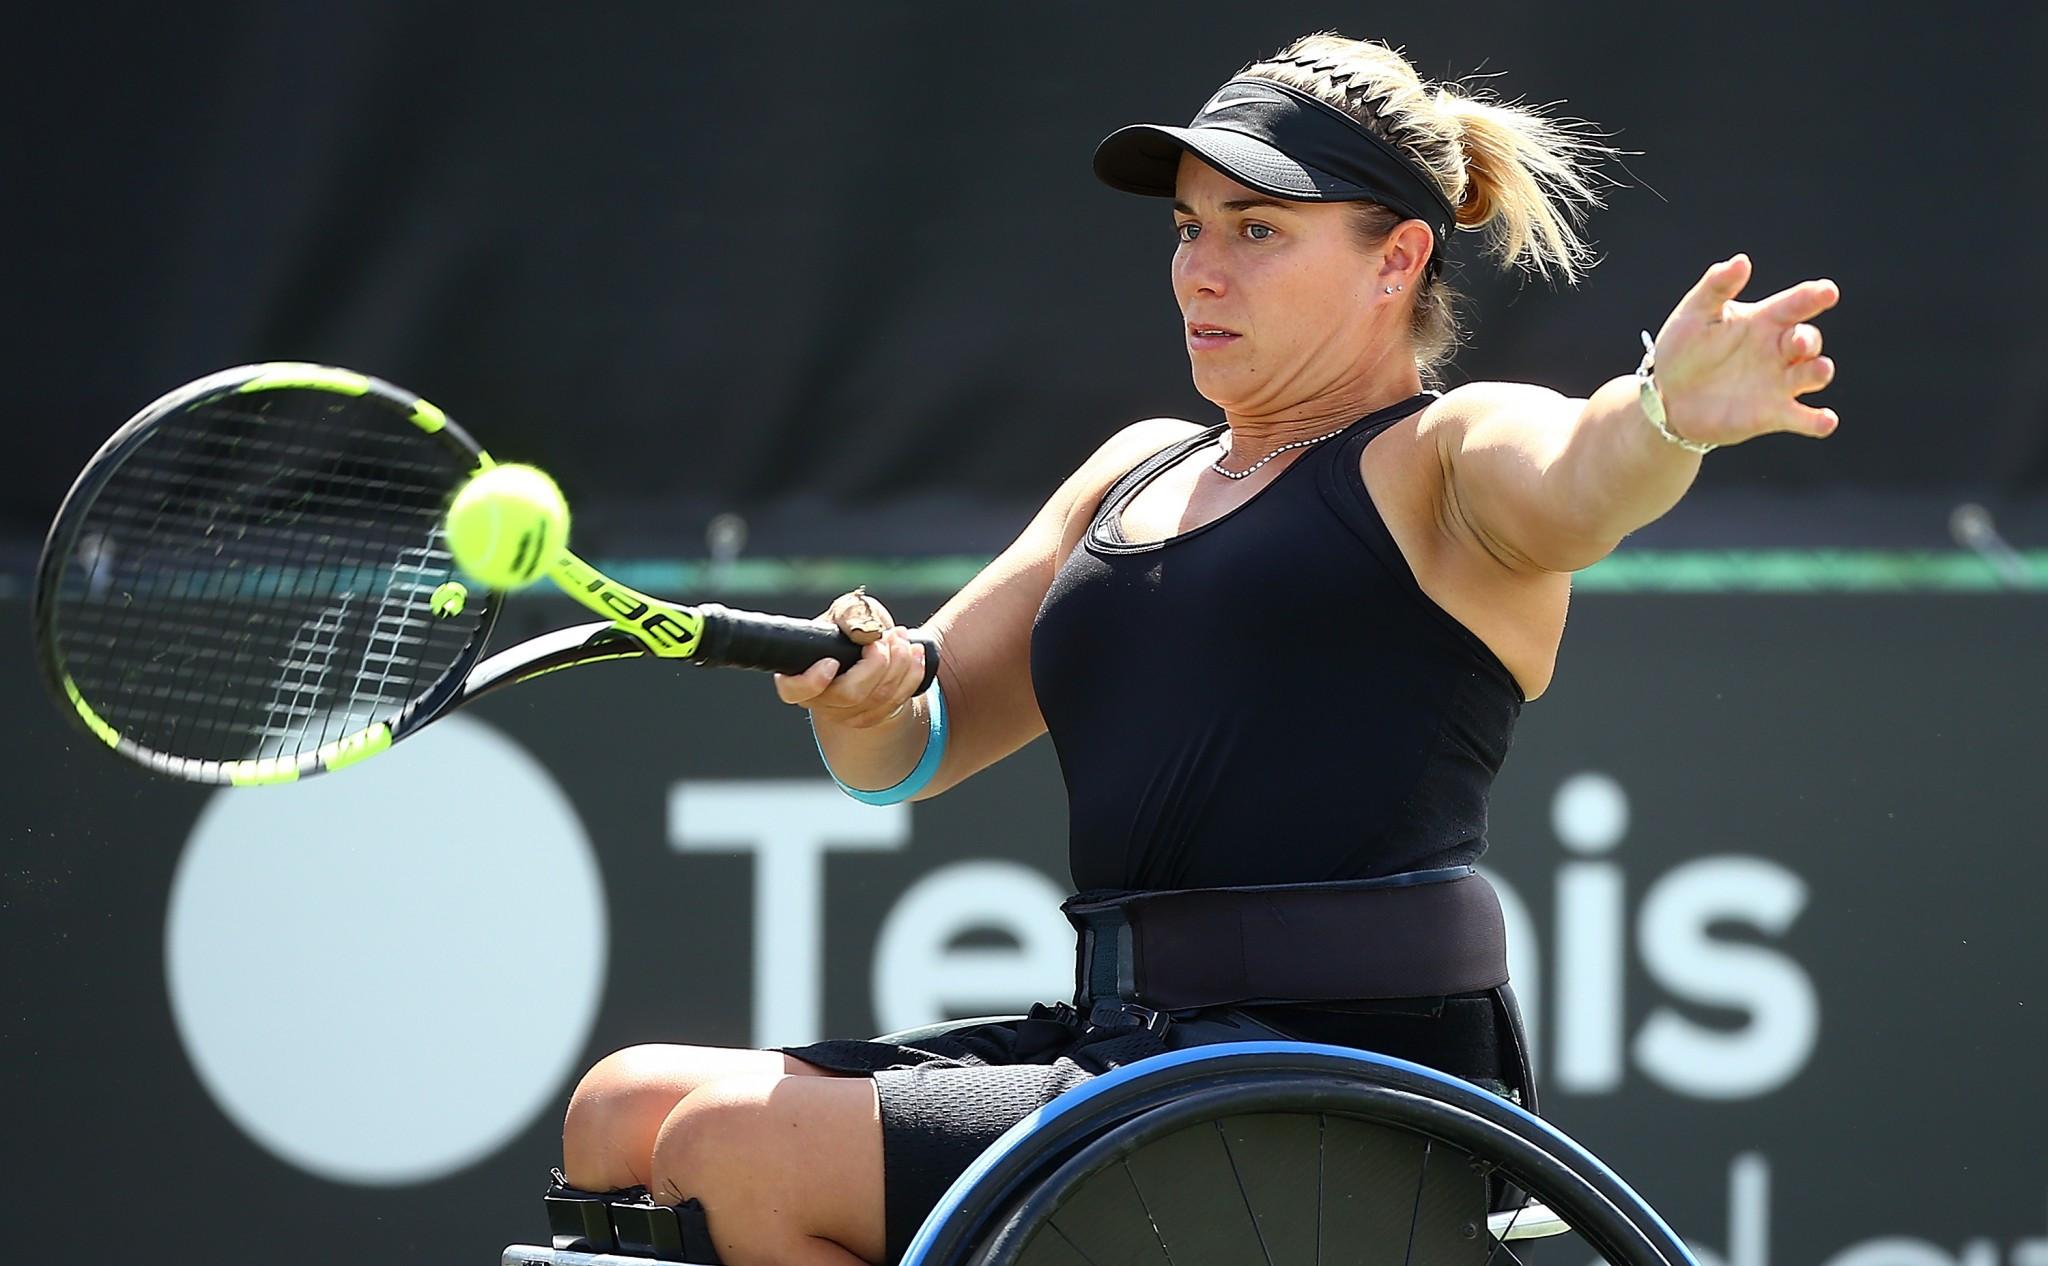 Shuker survives fightback in British Open Wheelchair Tennis Championships